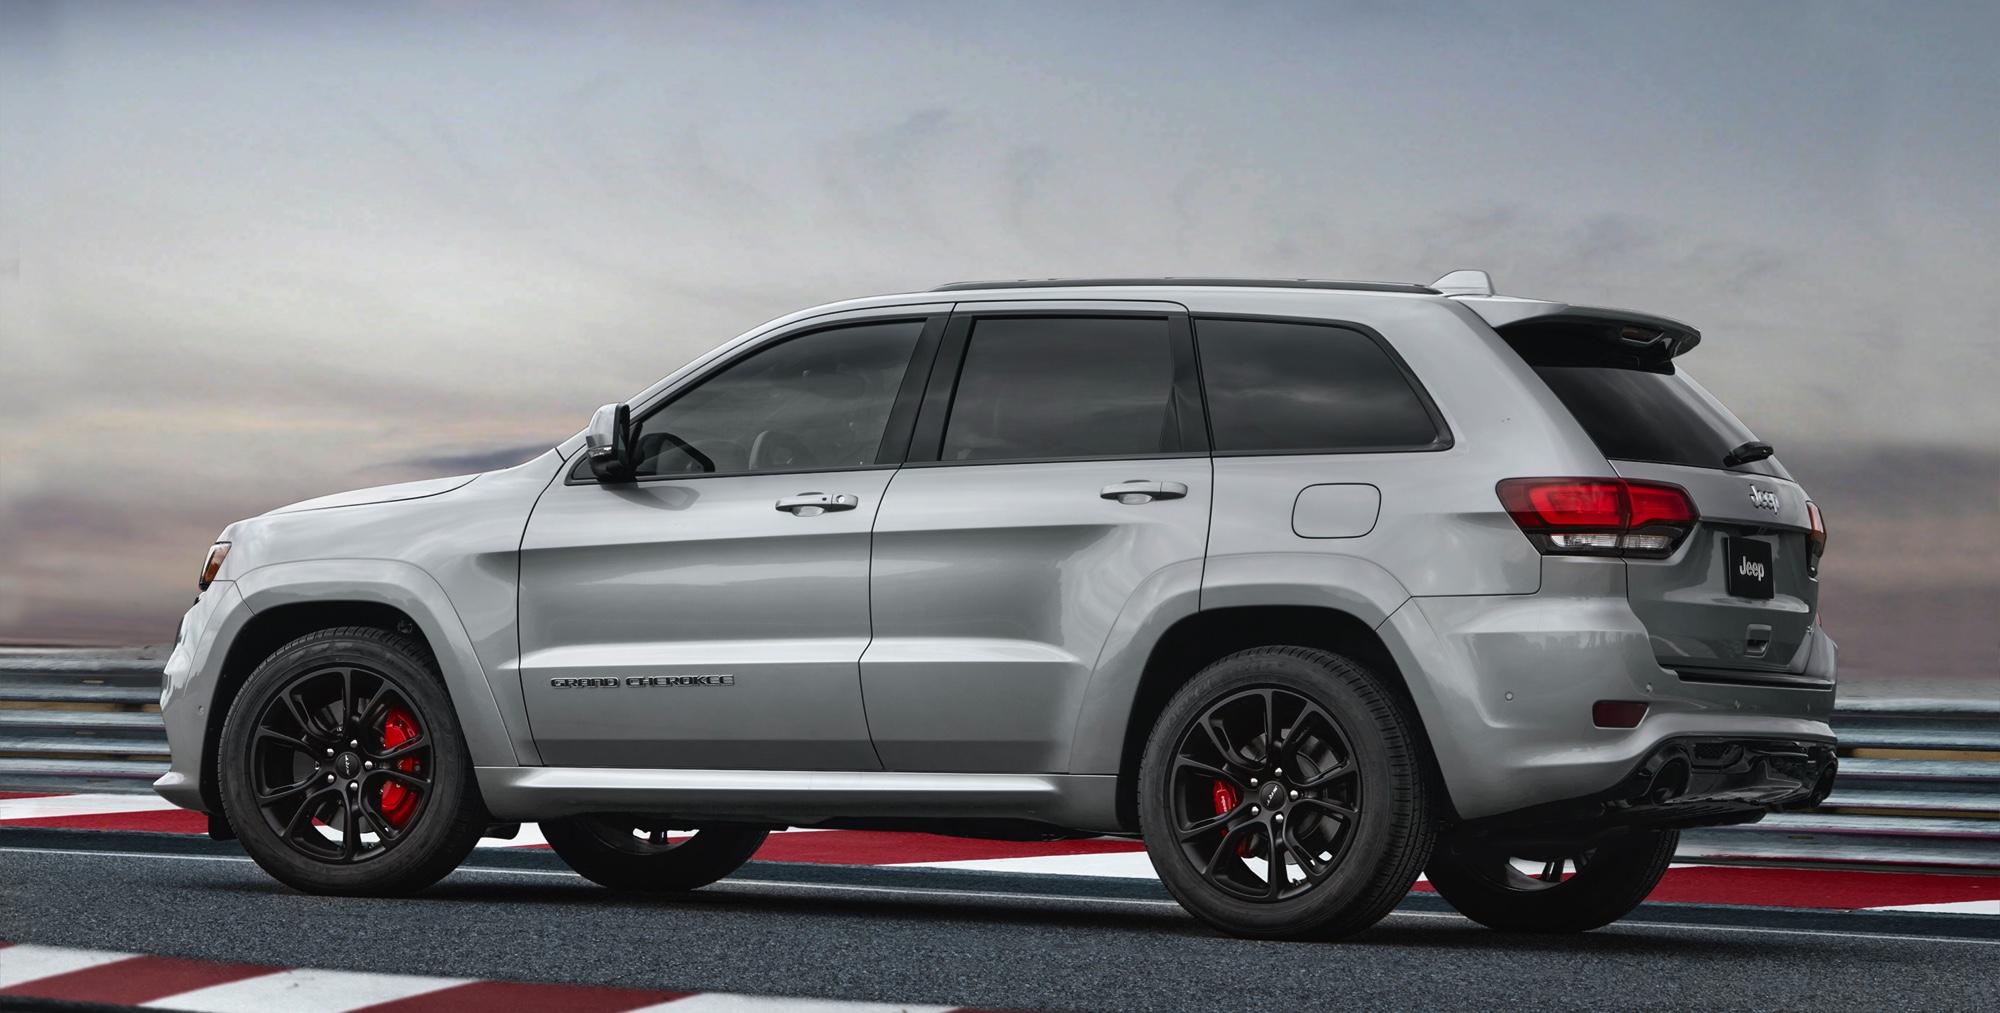 Jeep Grand Cherokee Trackhawk - Autovisie.nl